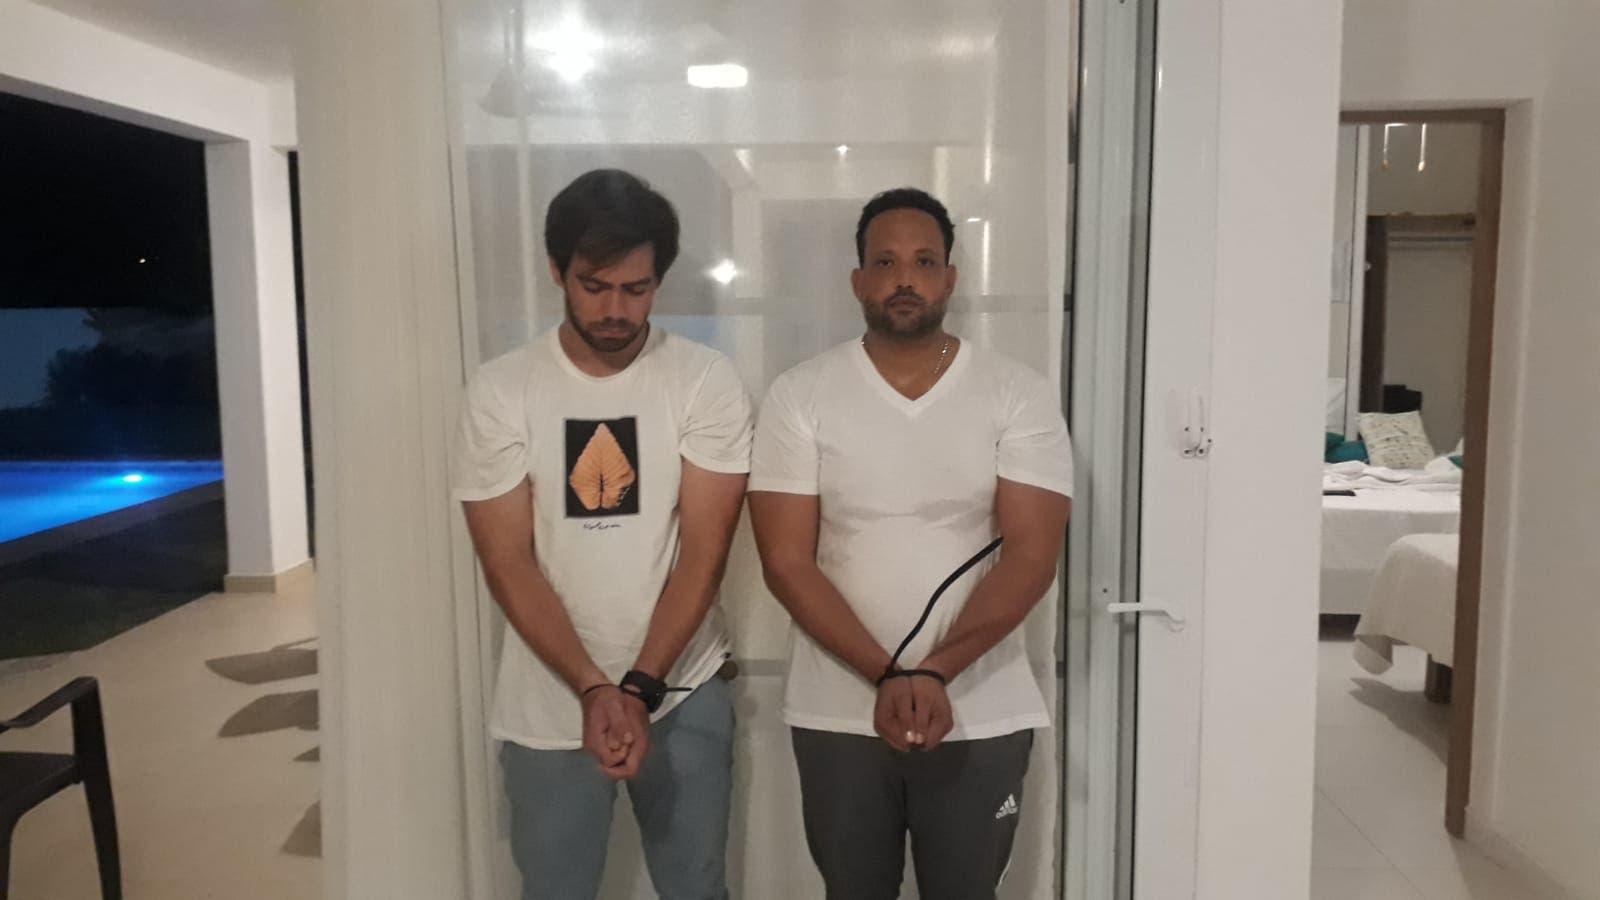 Ministerio Público solicitará 18 meses de prisión contra Juan Carlos Mosquea